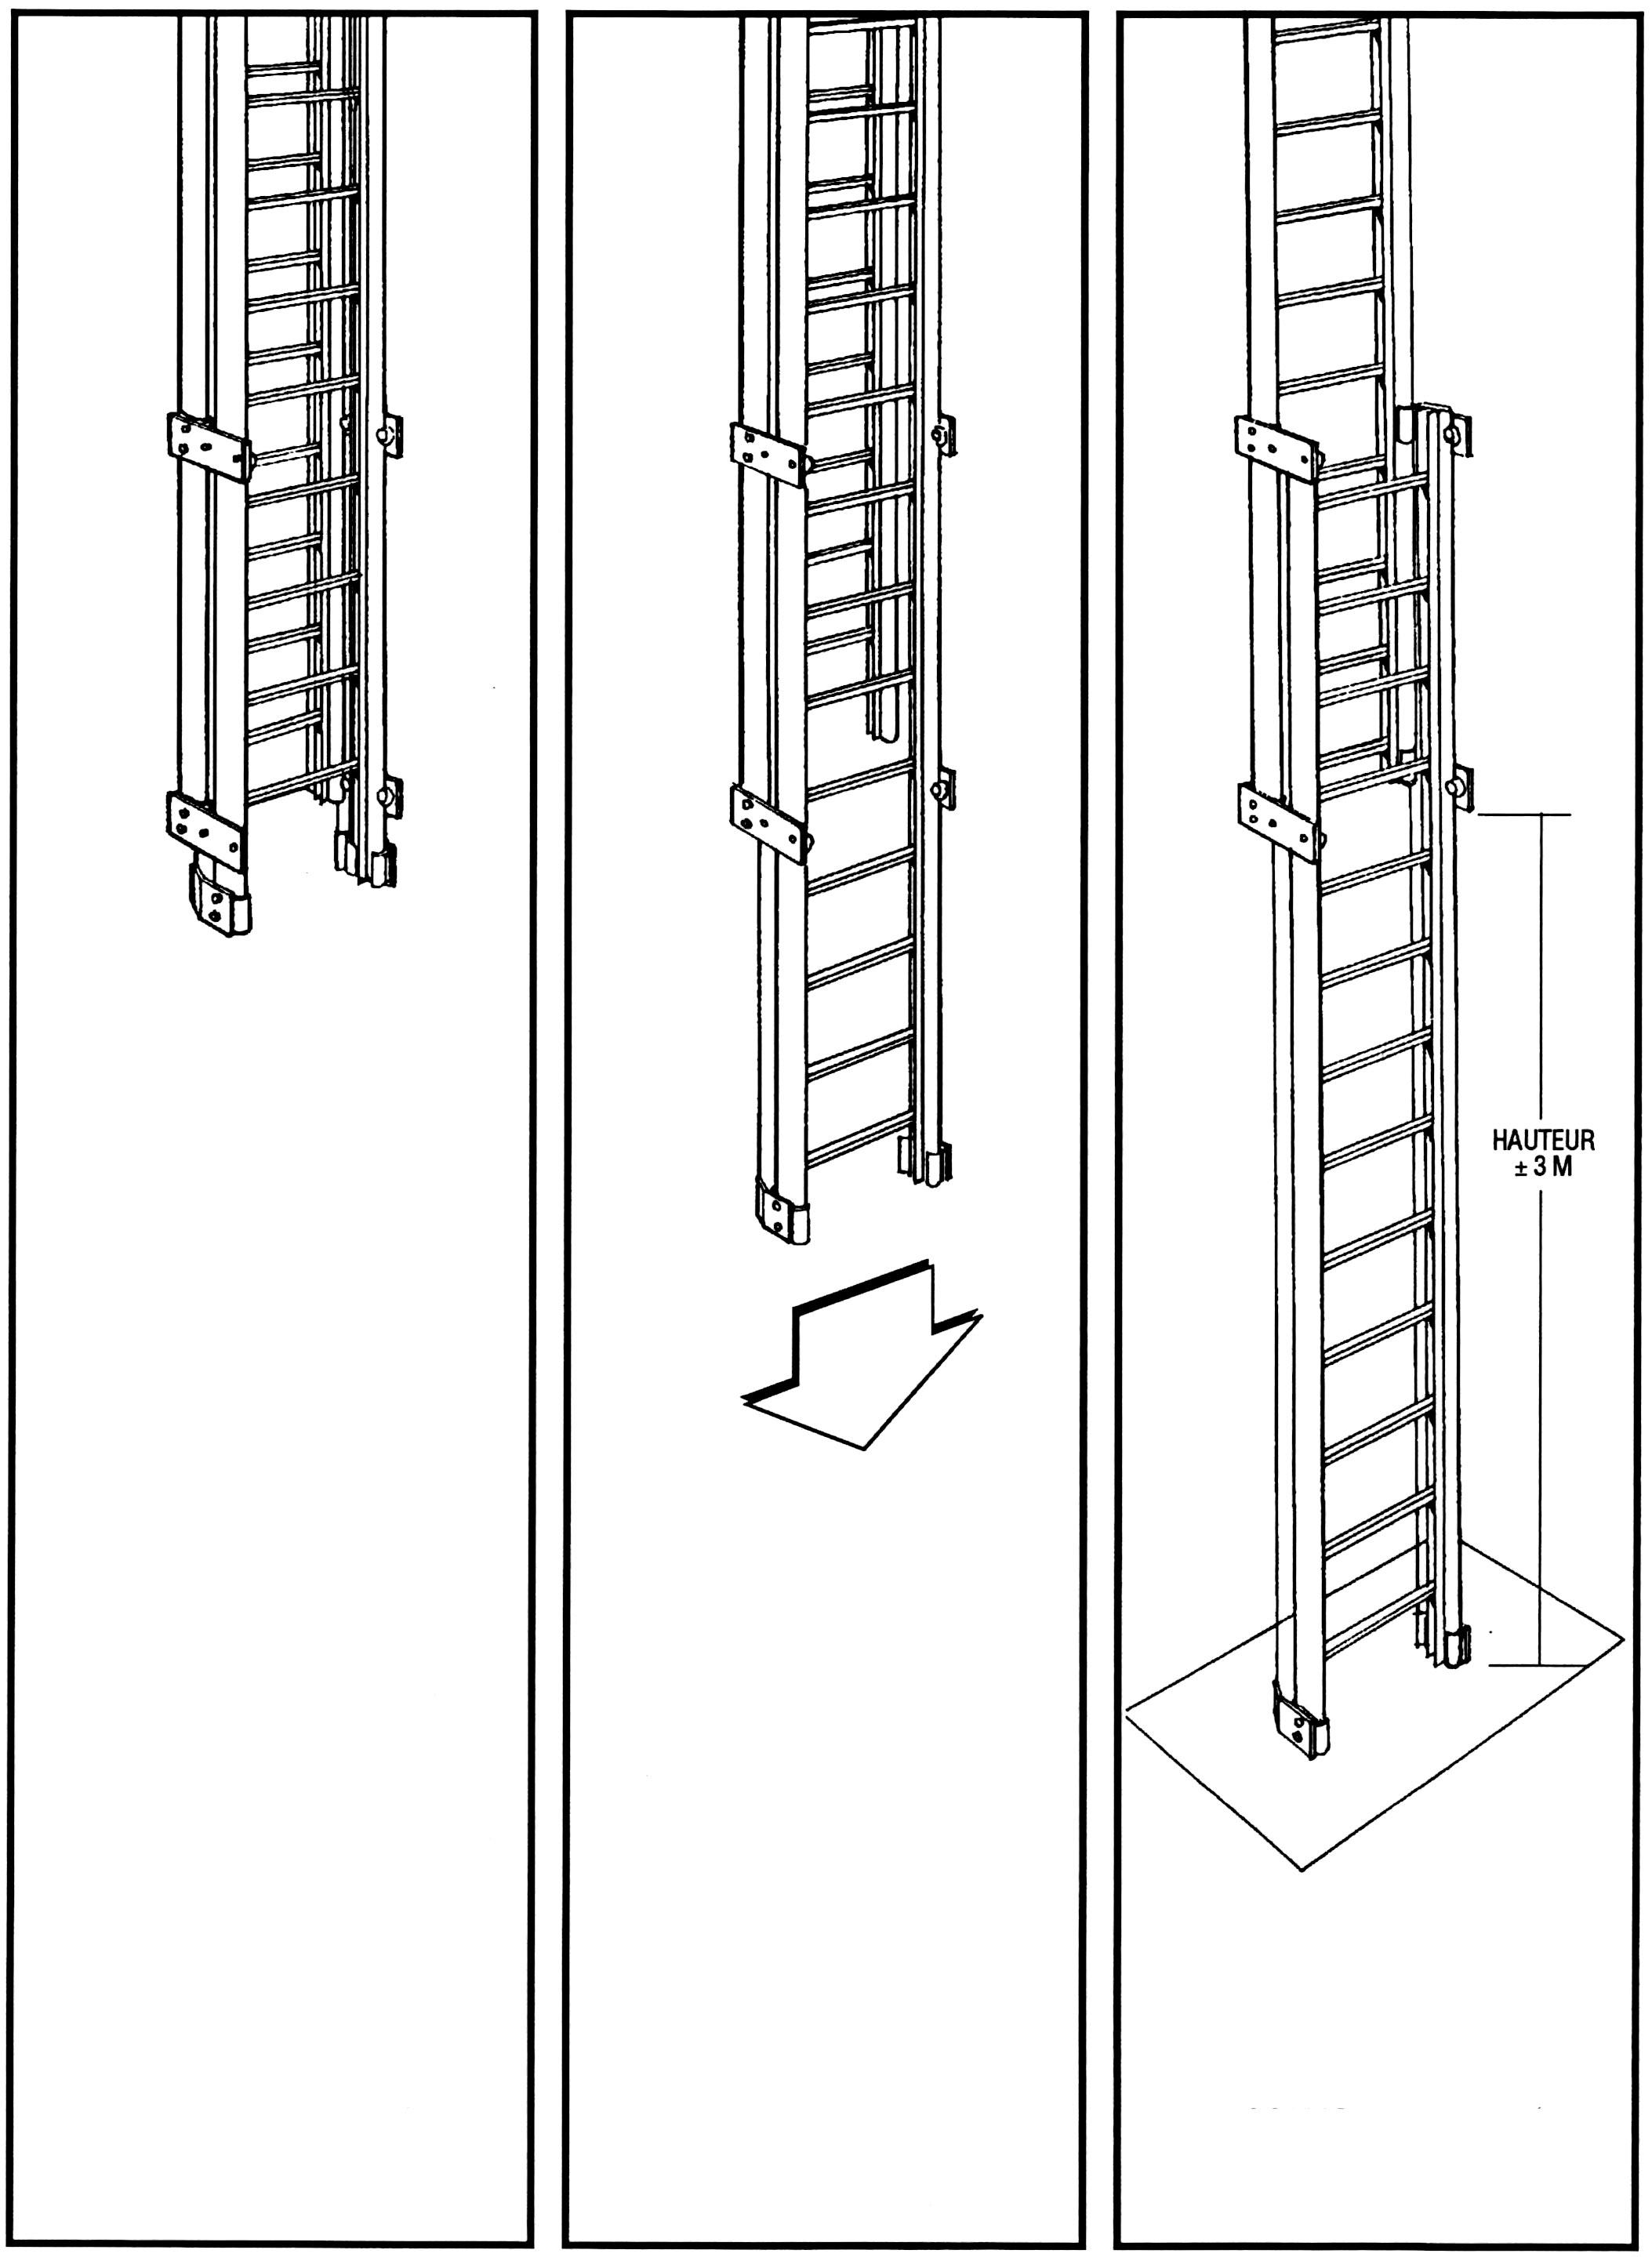 Counter-balanced ladder, base section